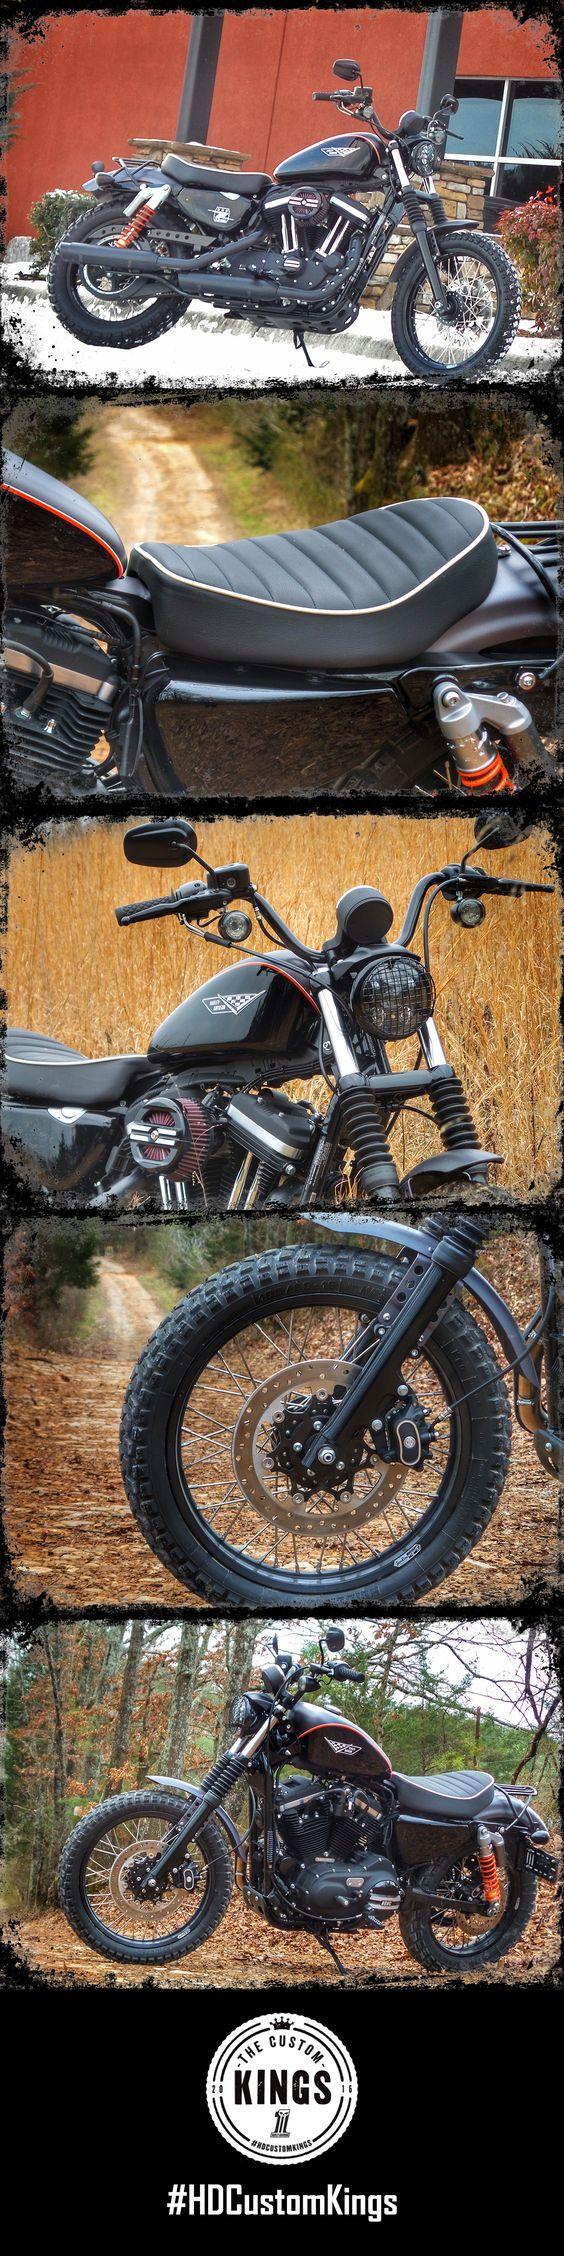 Smoky Moutain Harley-Davidson built